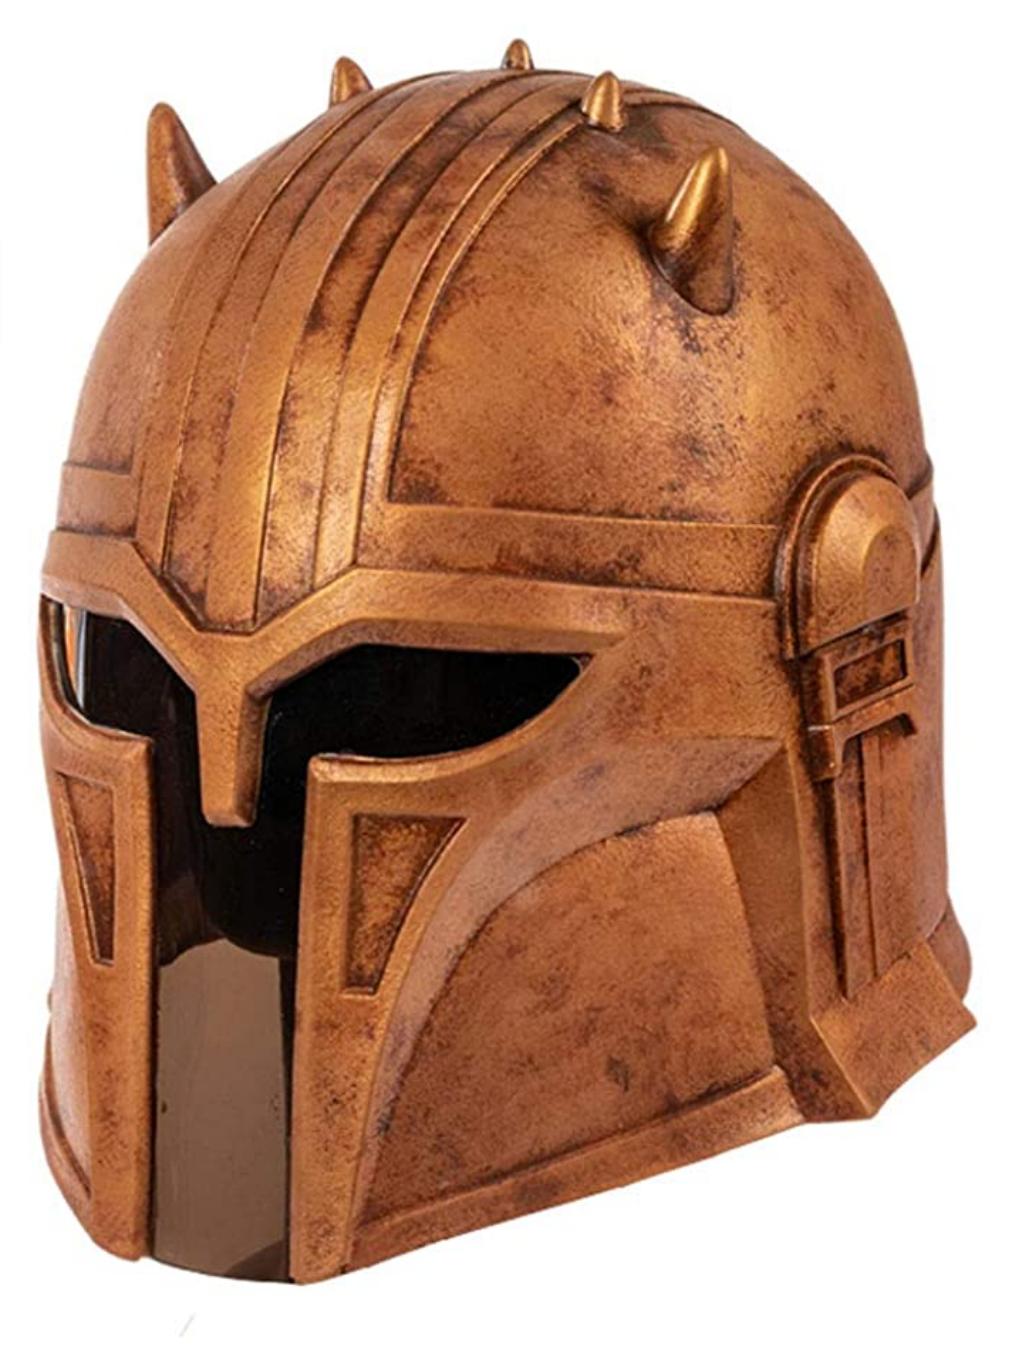 TM The Armorer Helmet Halloween Mask 2